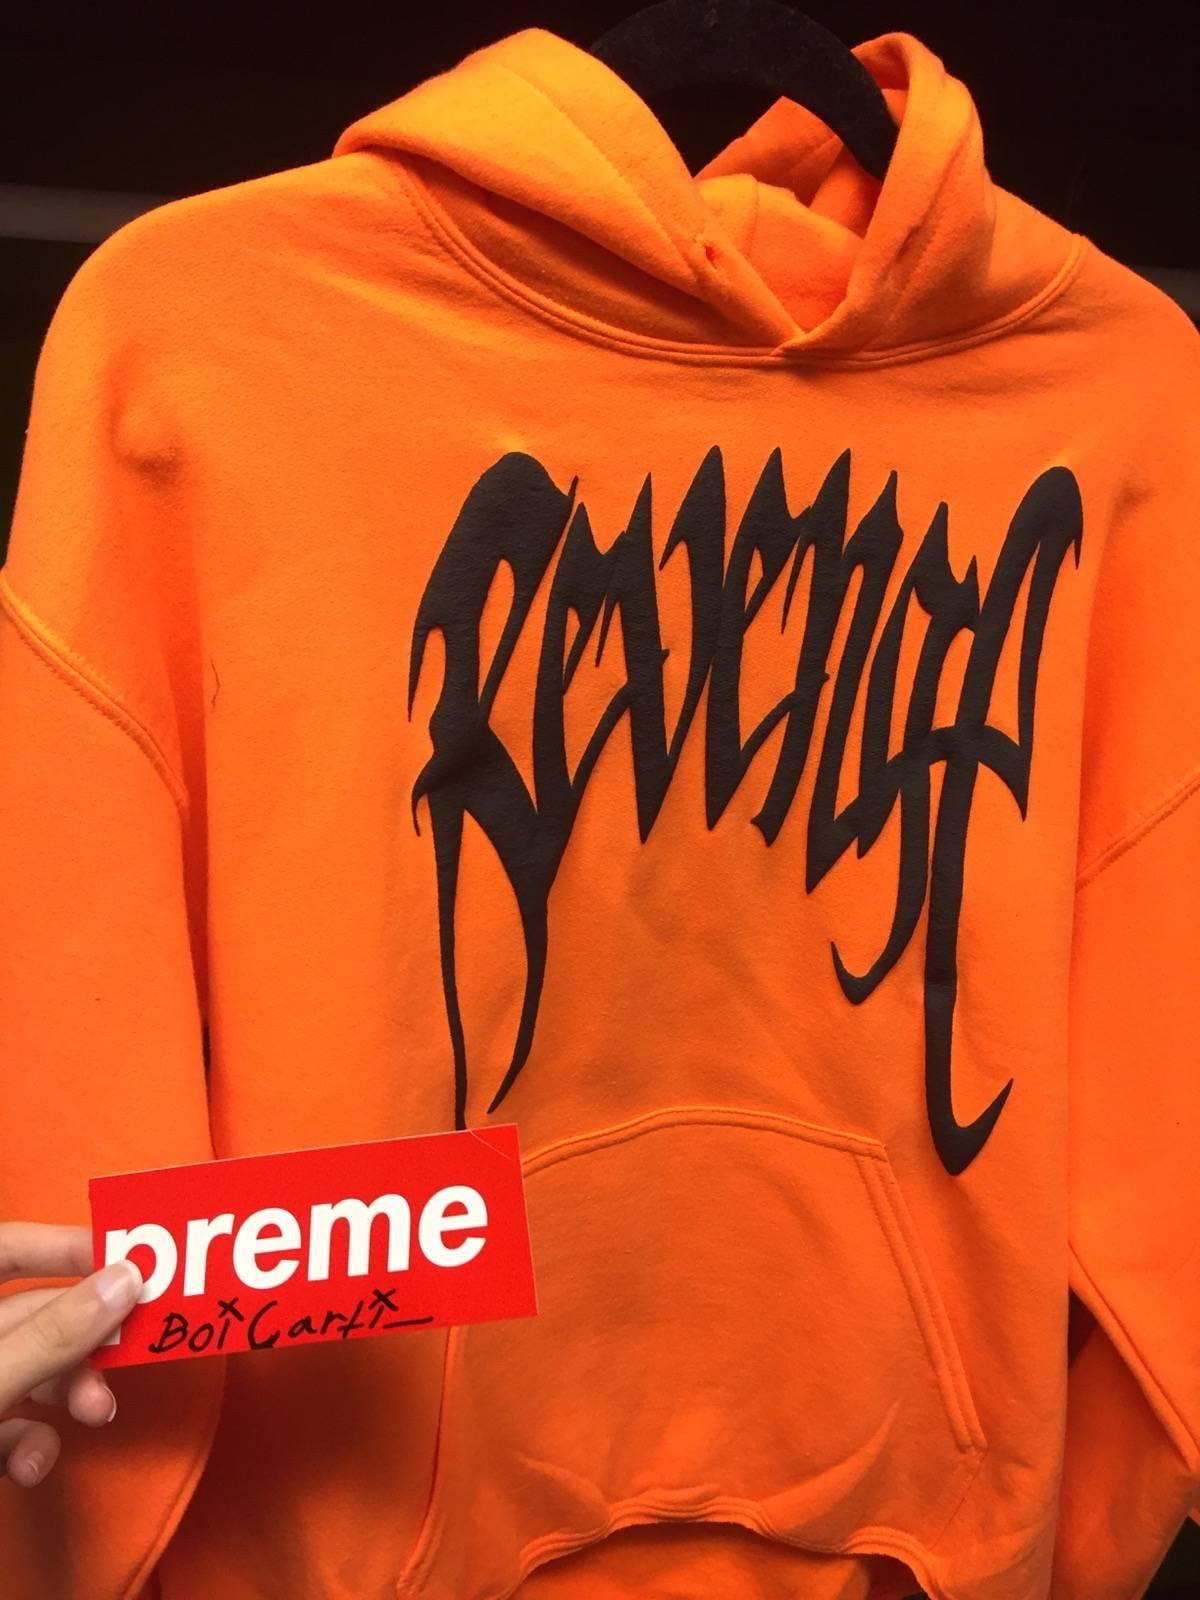 Revenge Revenge X Xxxtentacion Hoodie Size M Sweatshirts Amp Hoodies For Sale Grailed